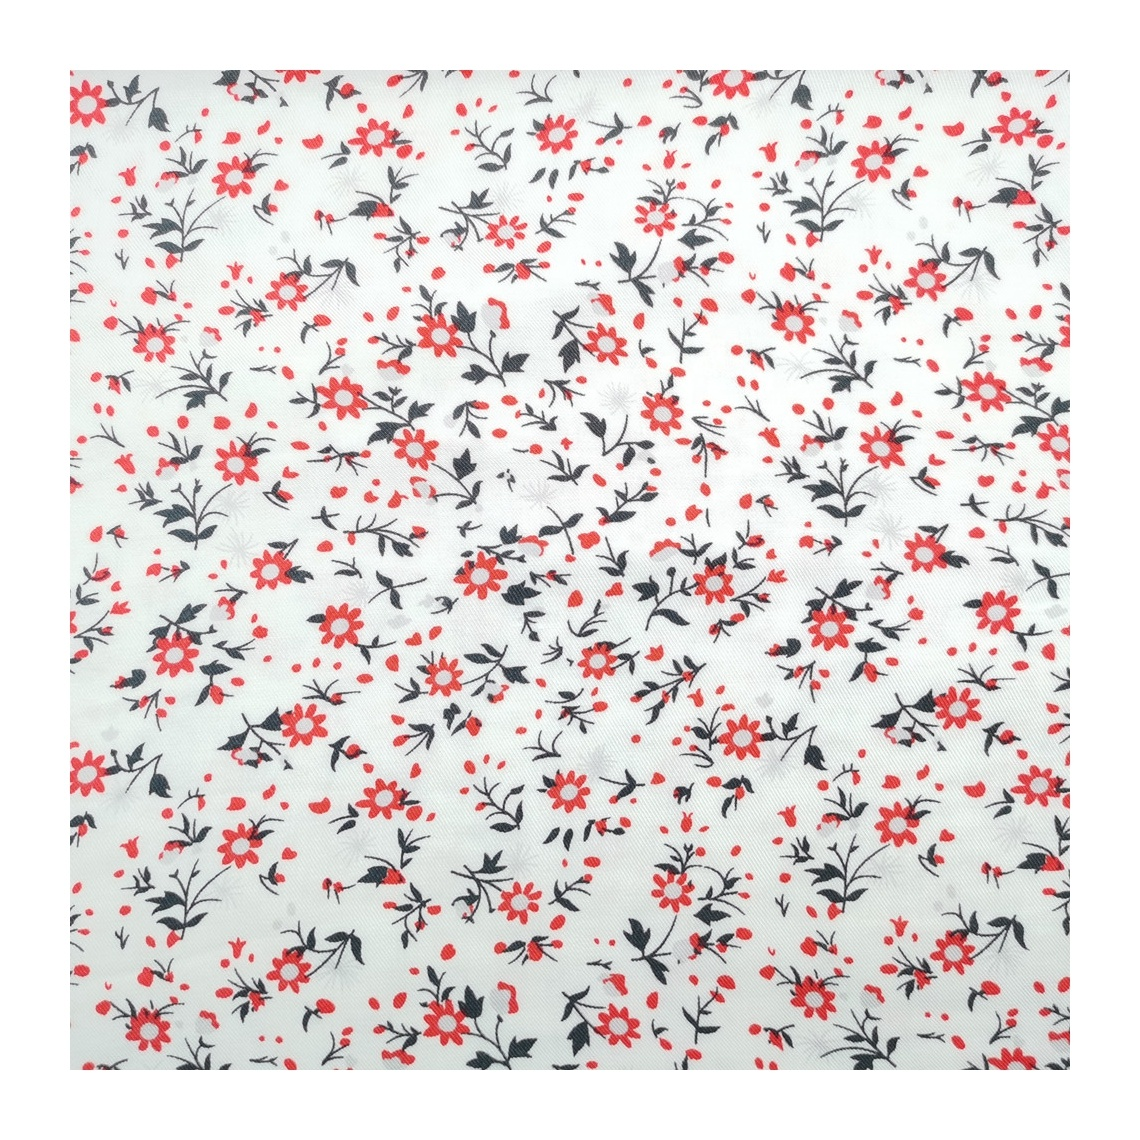 Hot Sale Challis 100%  Woven Rayon Viscose Custom Fabric Printing For Dress